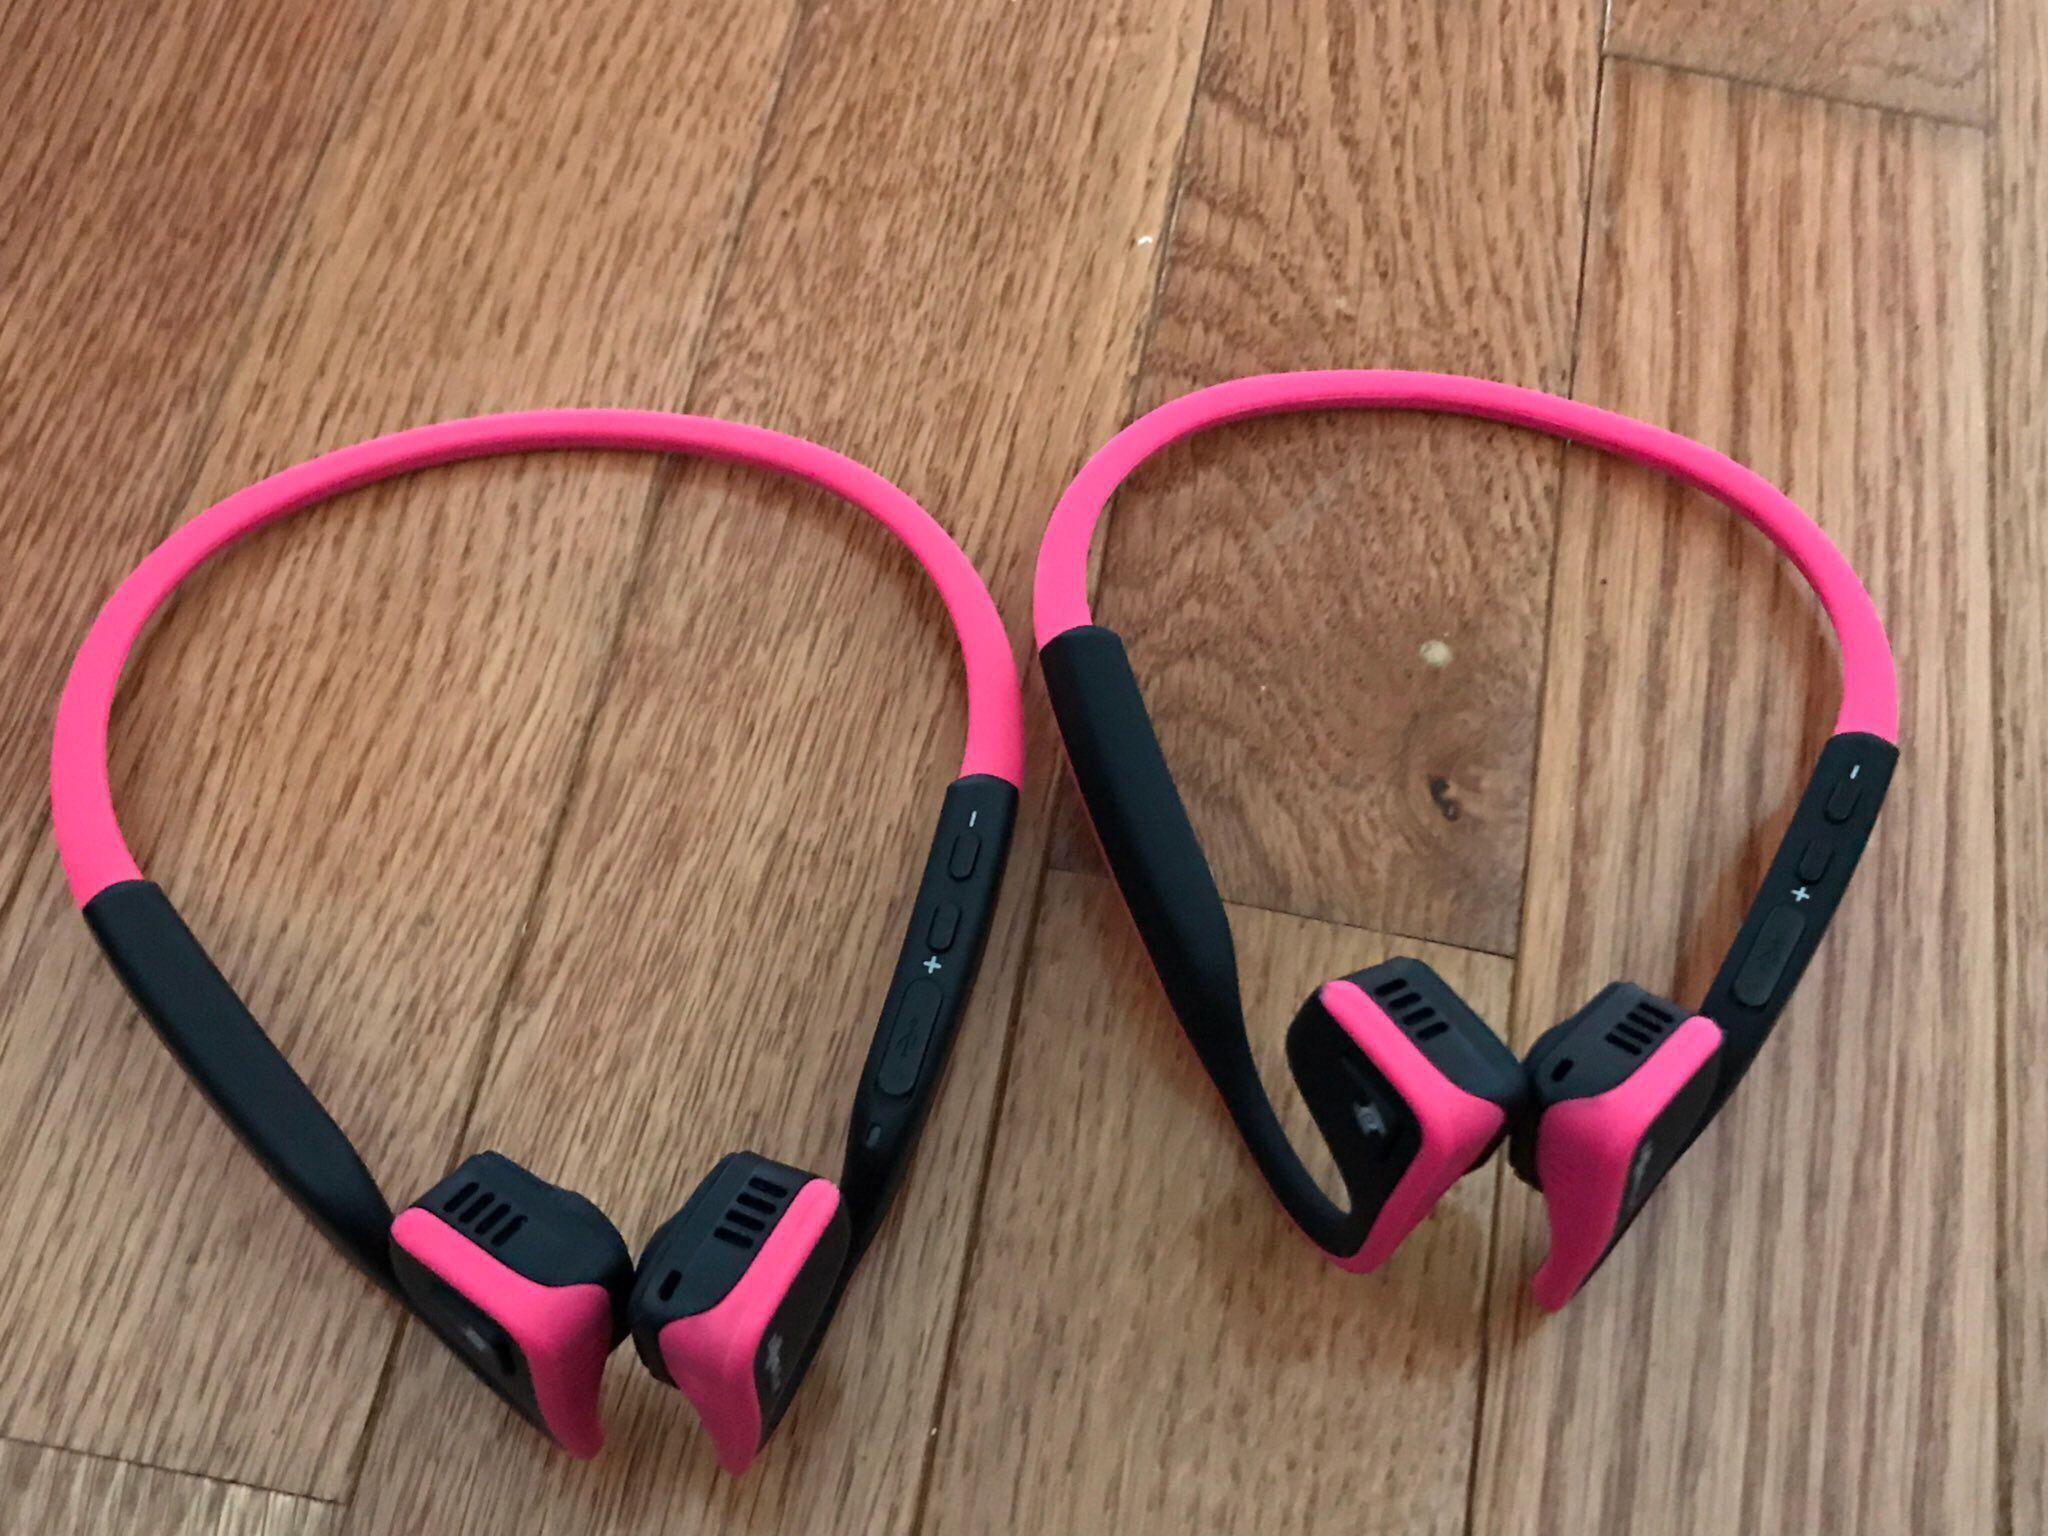 7d3cc00becc Review: Trekz Titanium Mini | AfterShokz Open-Ear Headphones ...